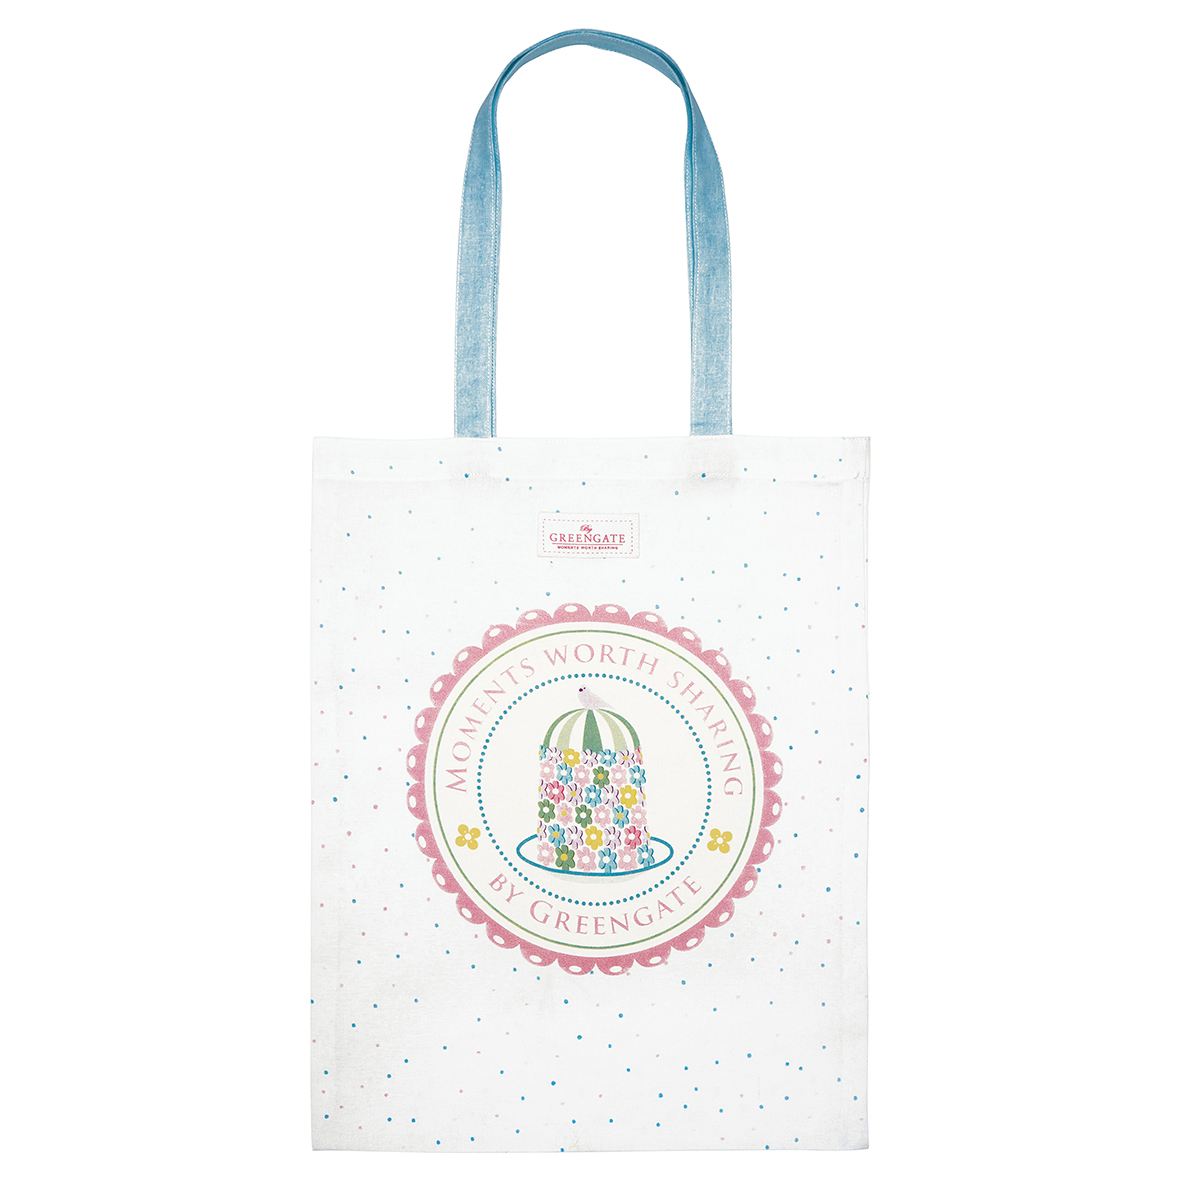 Tasche - Bag cotton - Tenna white - Greengate